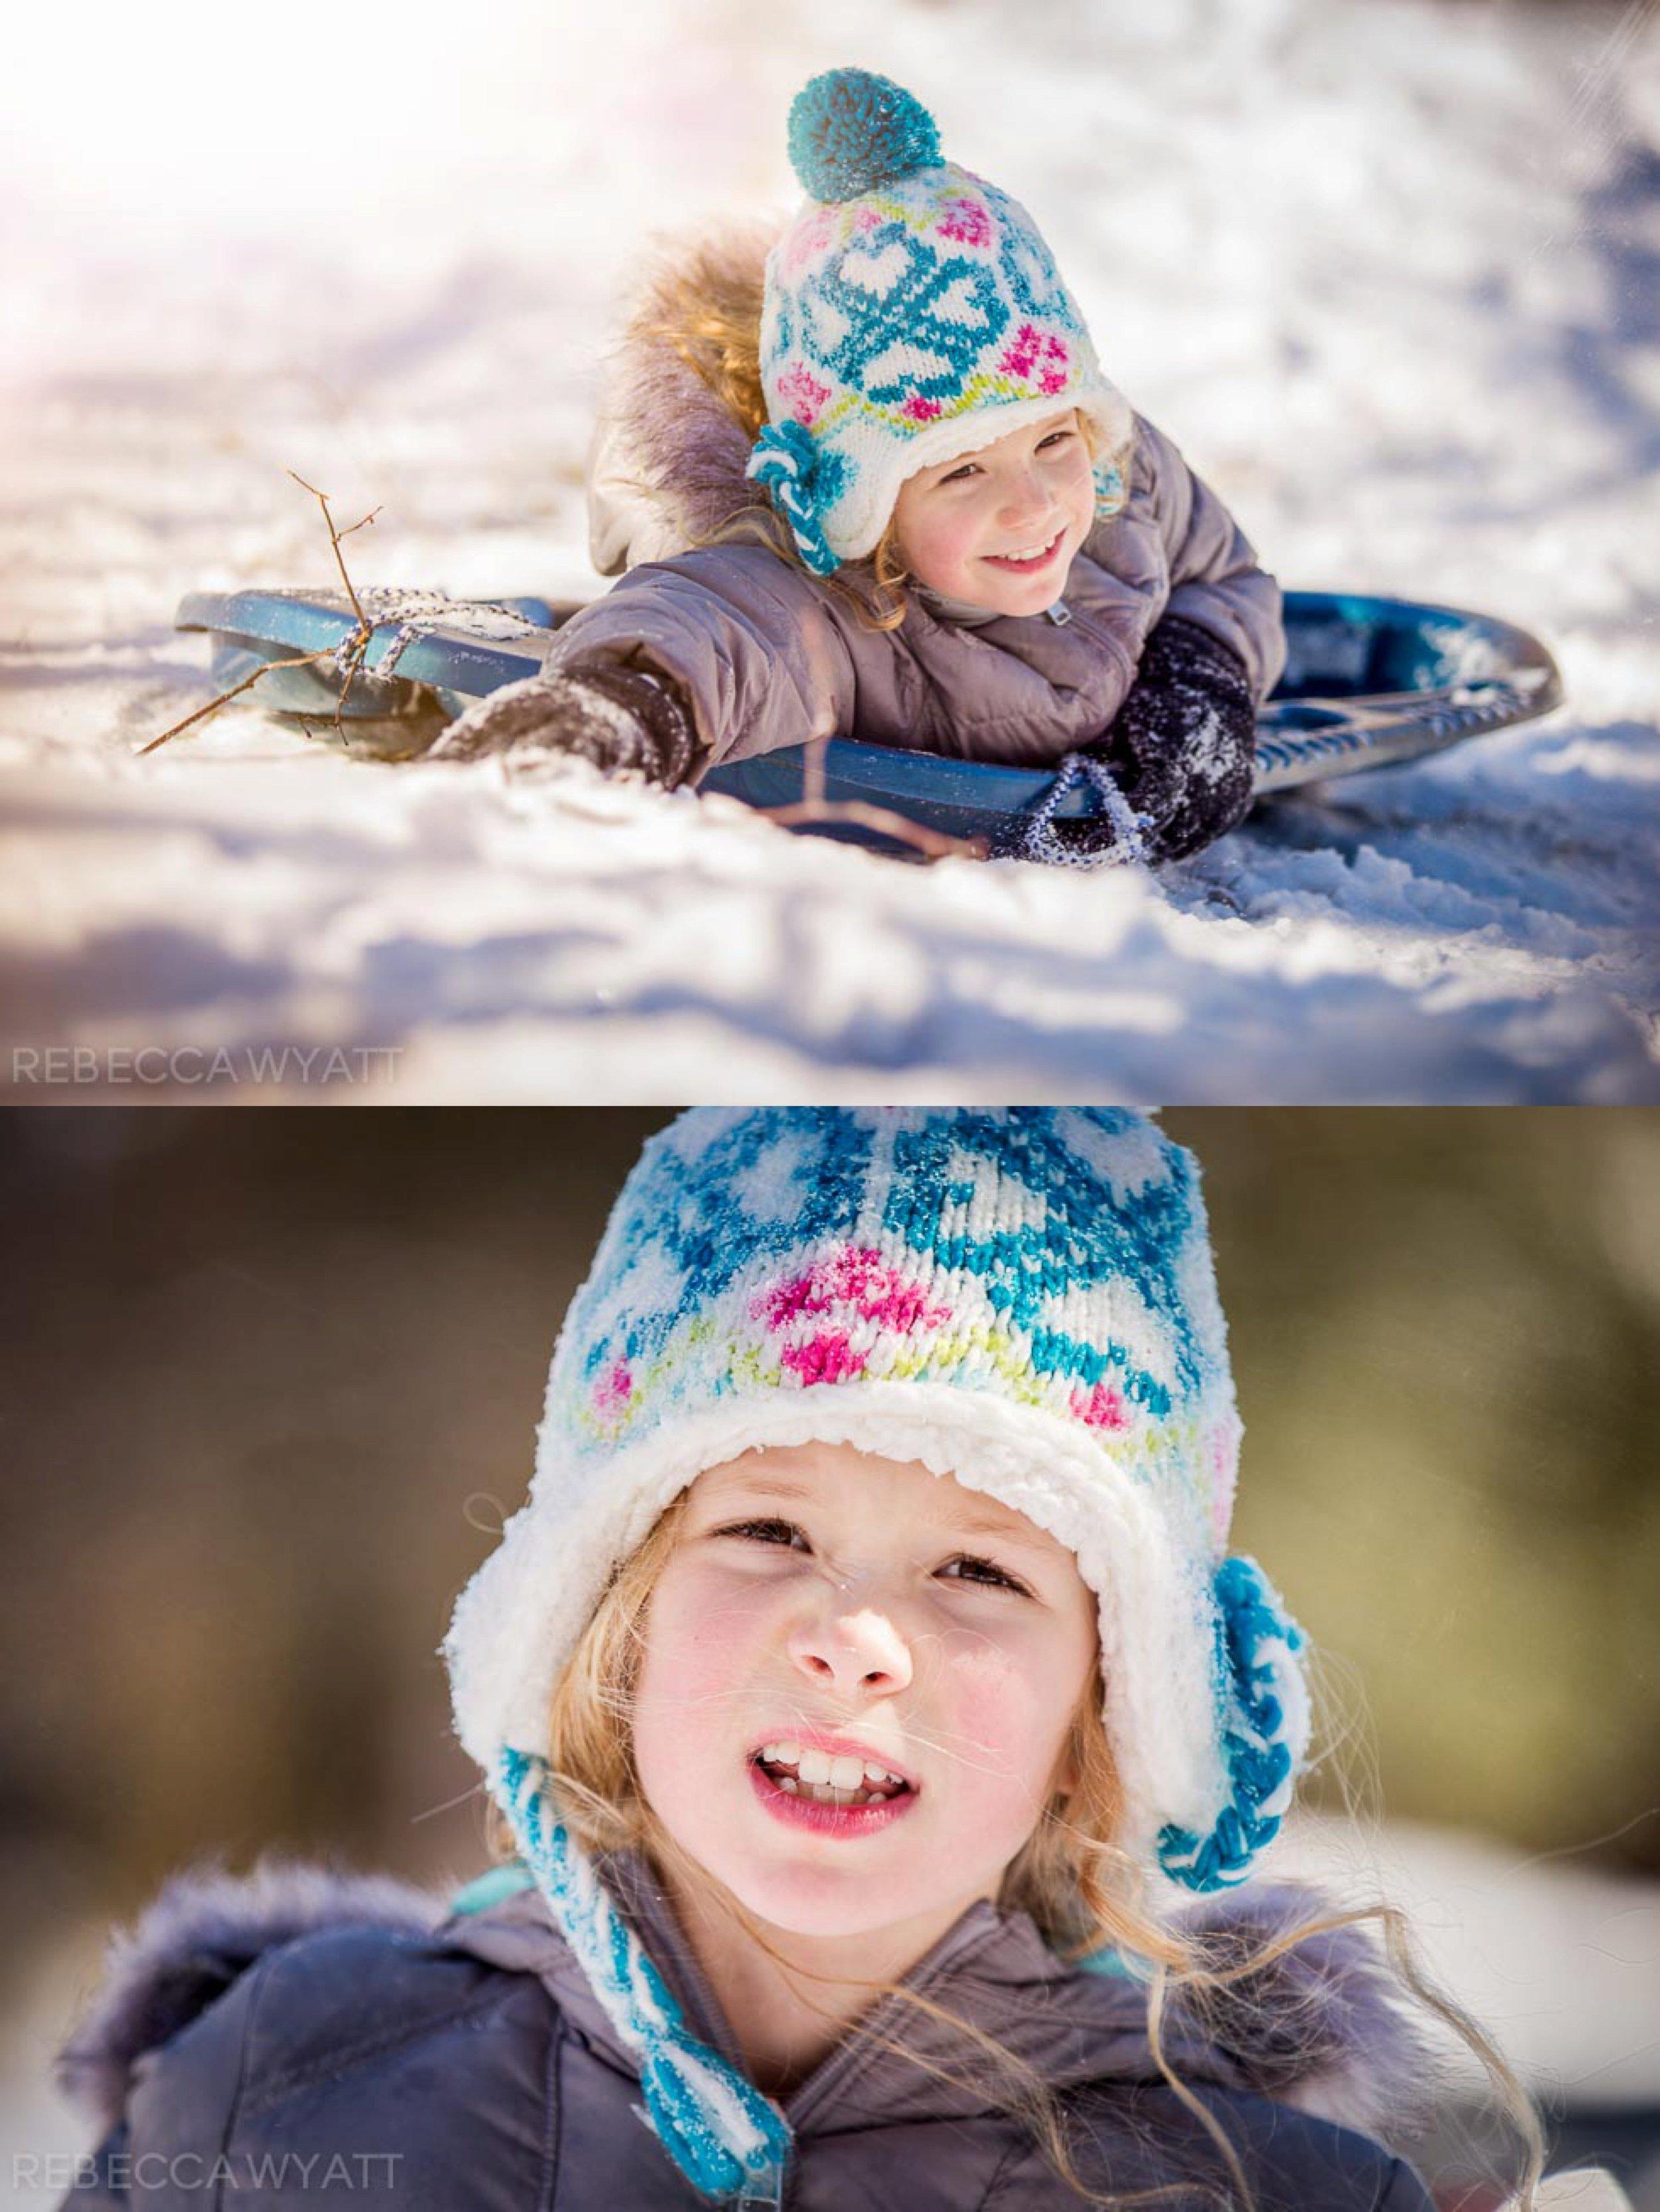 365-II,bartley,cm portfolio,feb 2015 cm,my favvorites,sled riding,snow day,